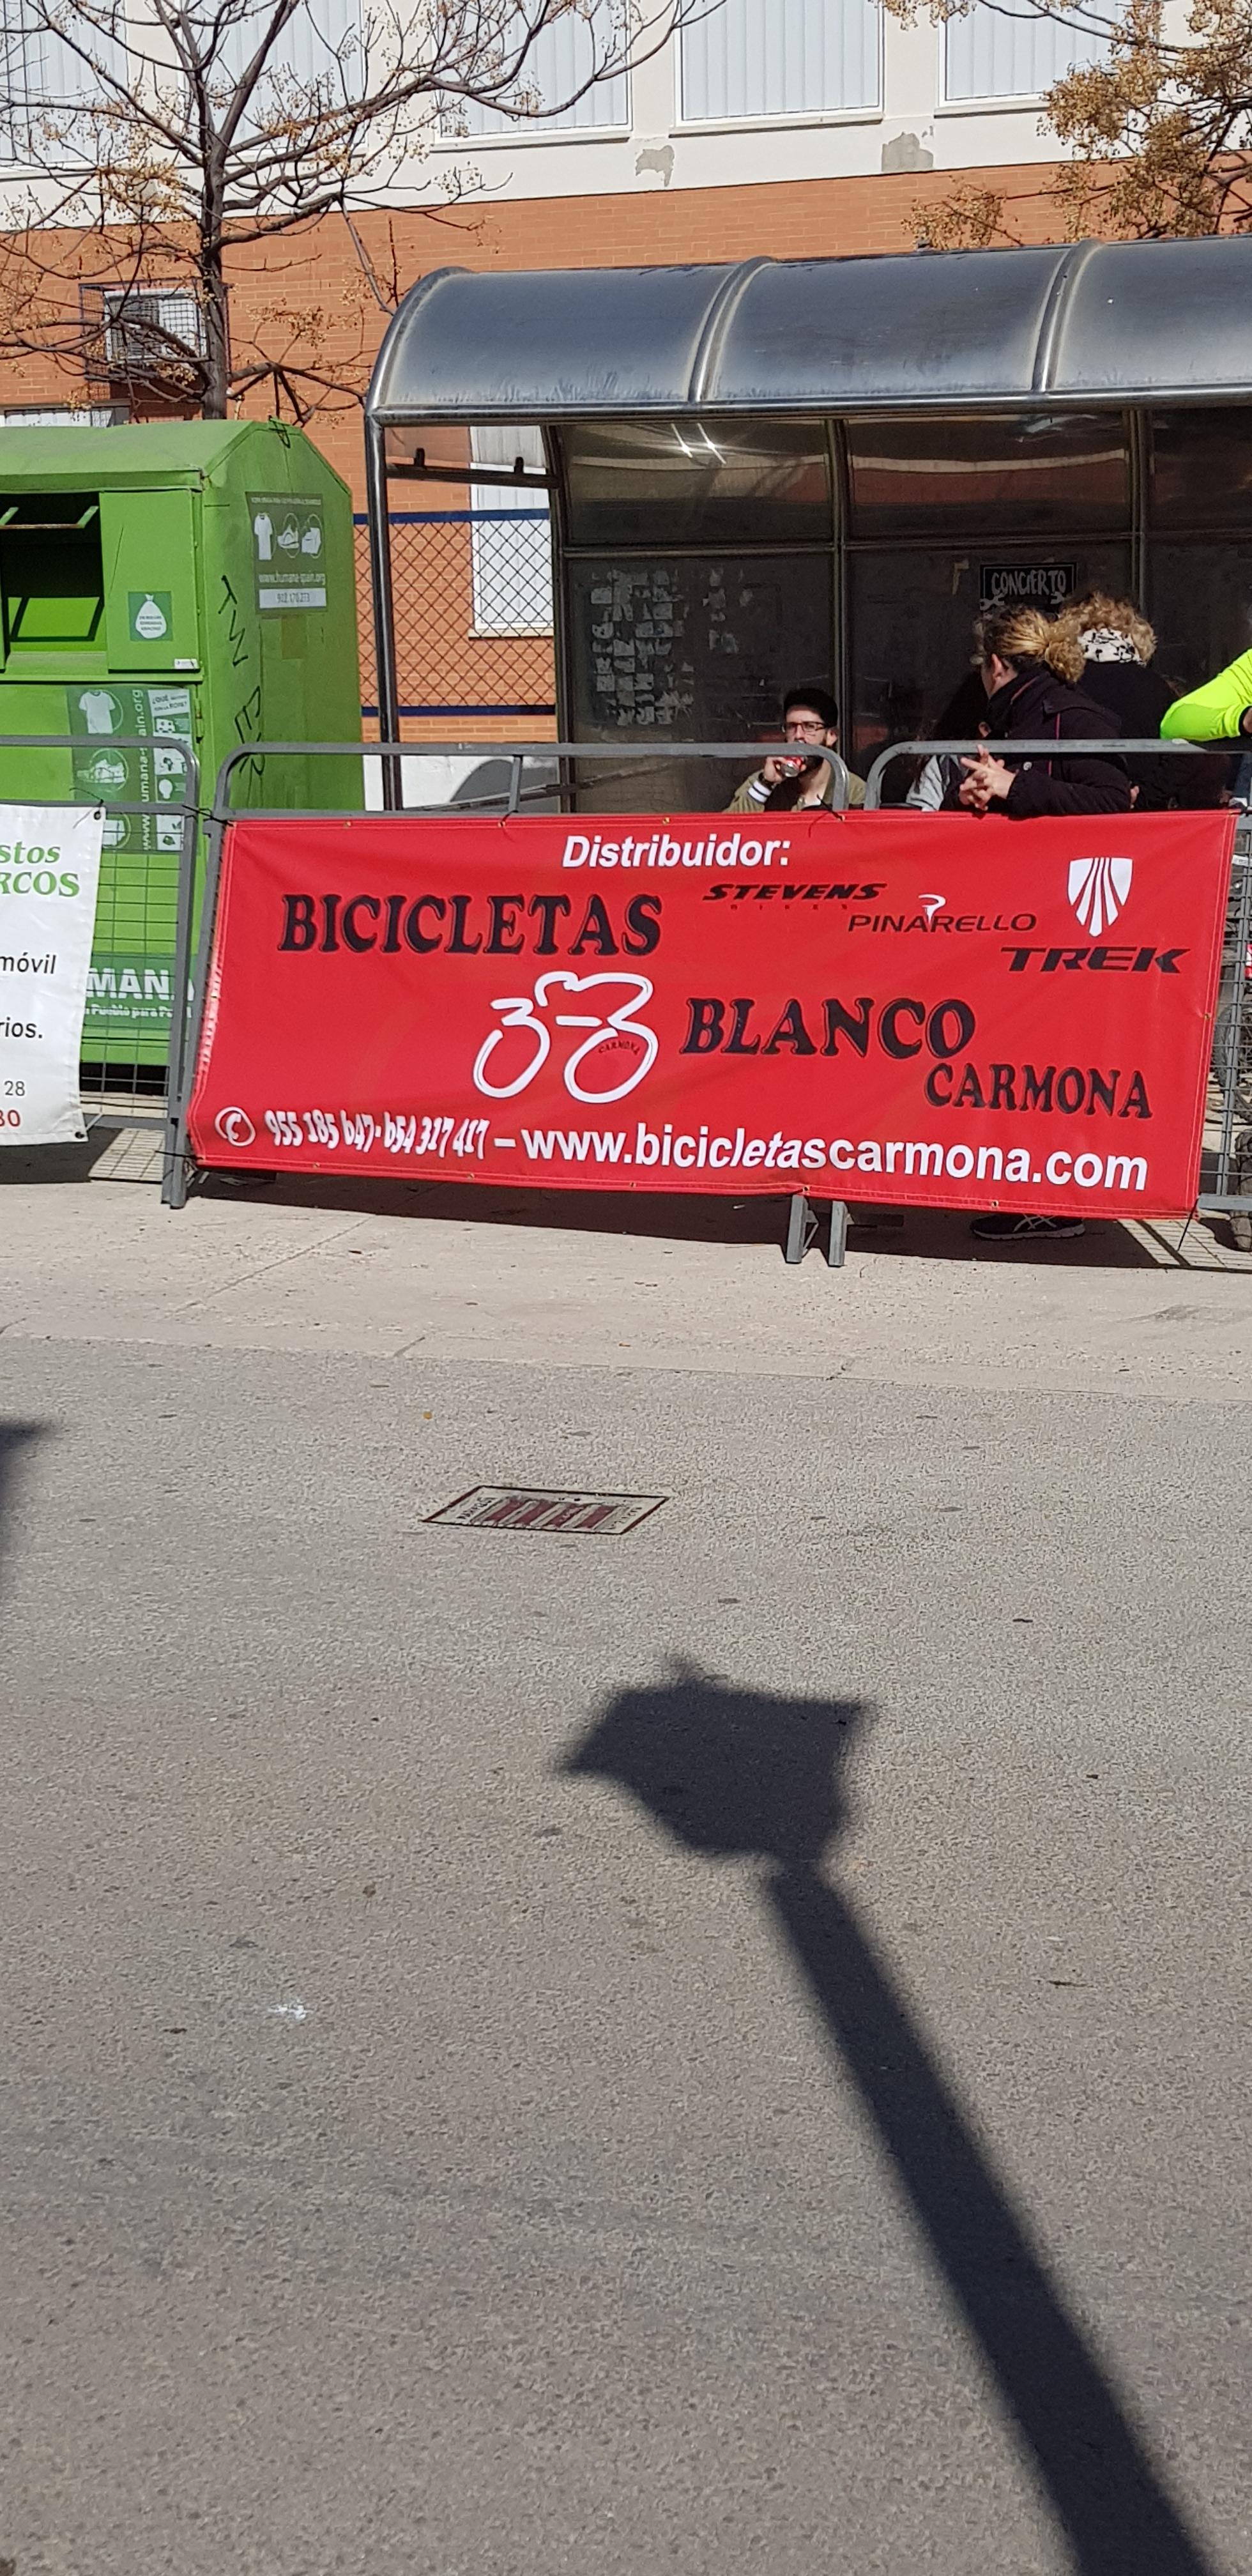 Bicicletas Blanco Carmona